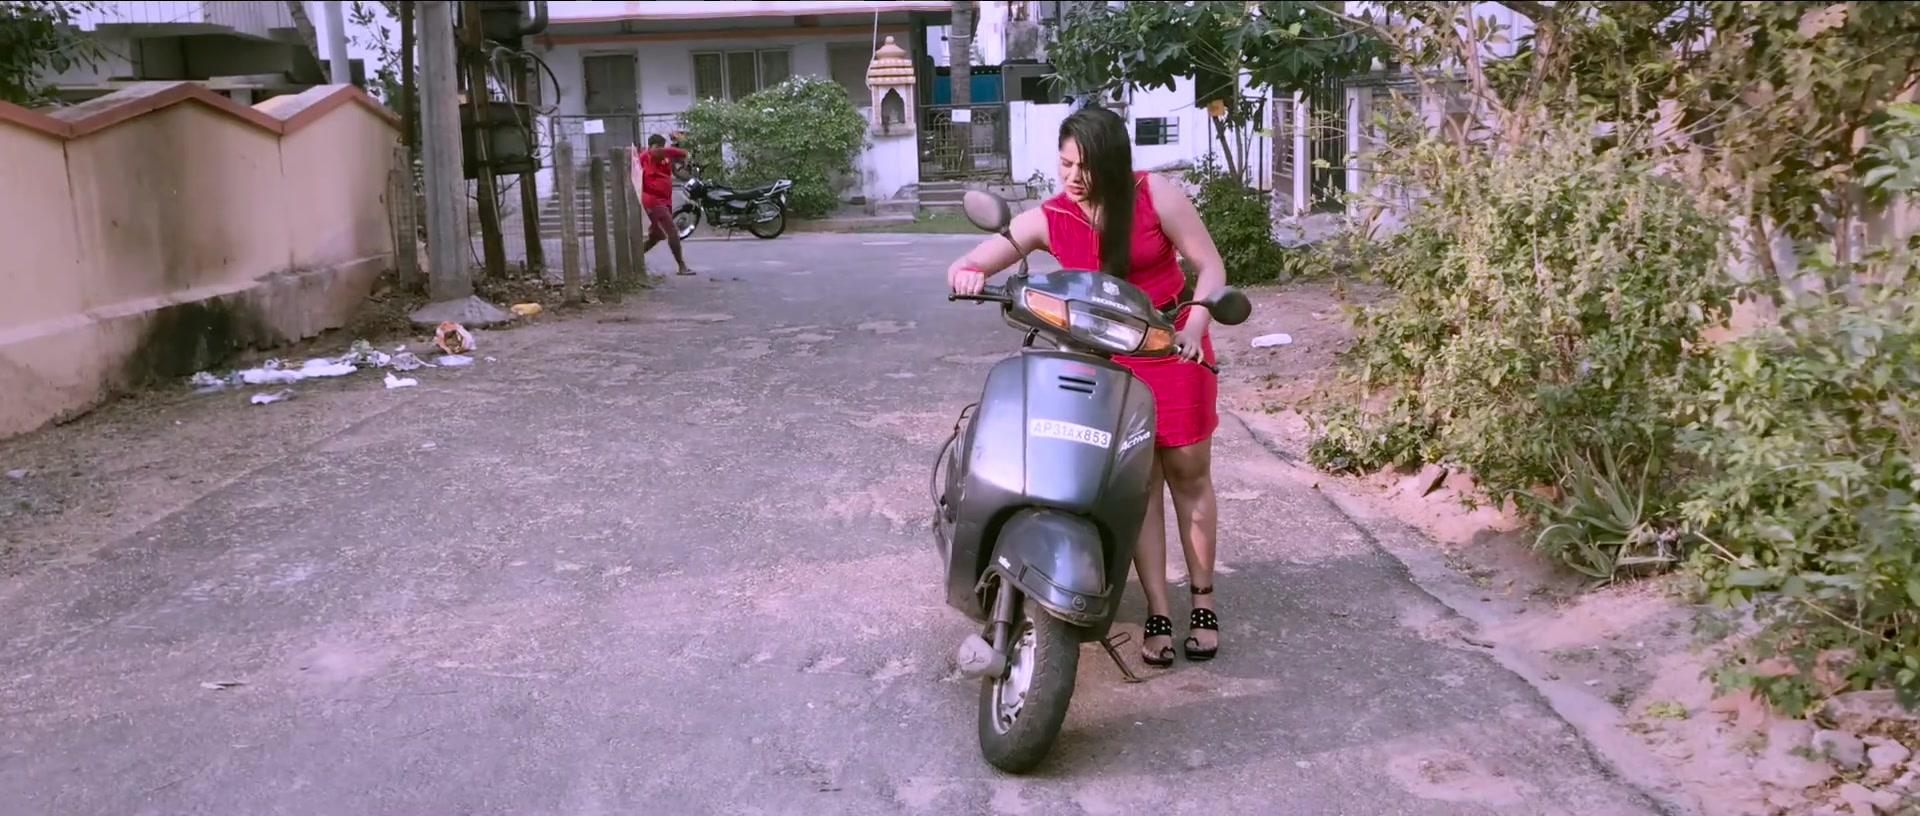 Beach Road Chetan (2019) Telugu 1080p WEB-DL 1080p AVC DD5 1 ESub-BWT